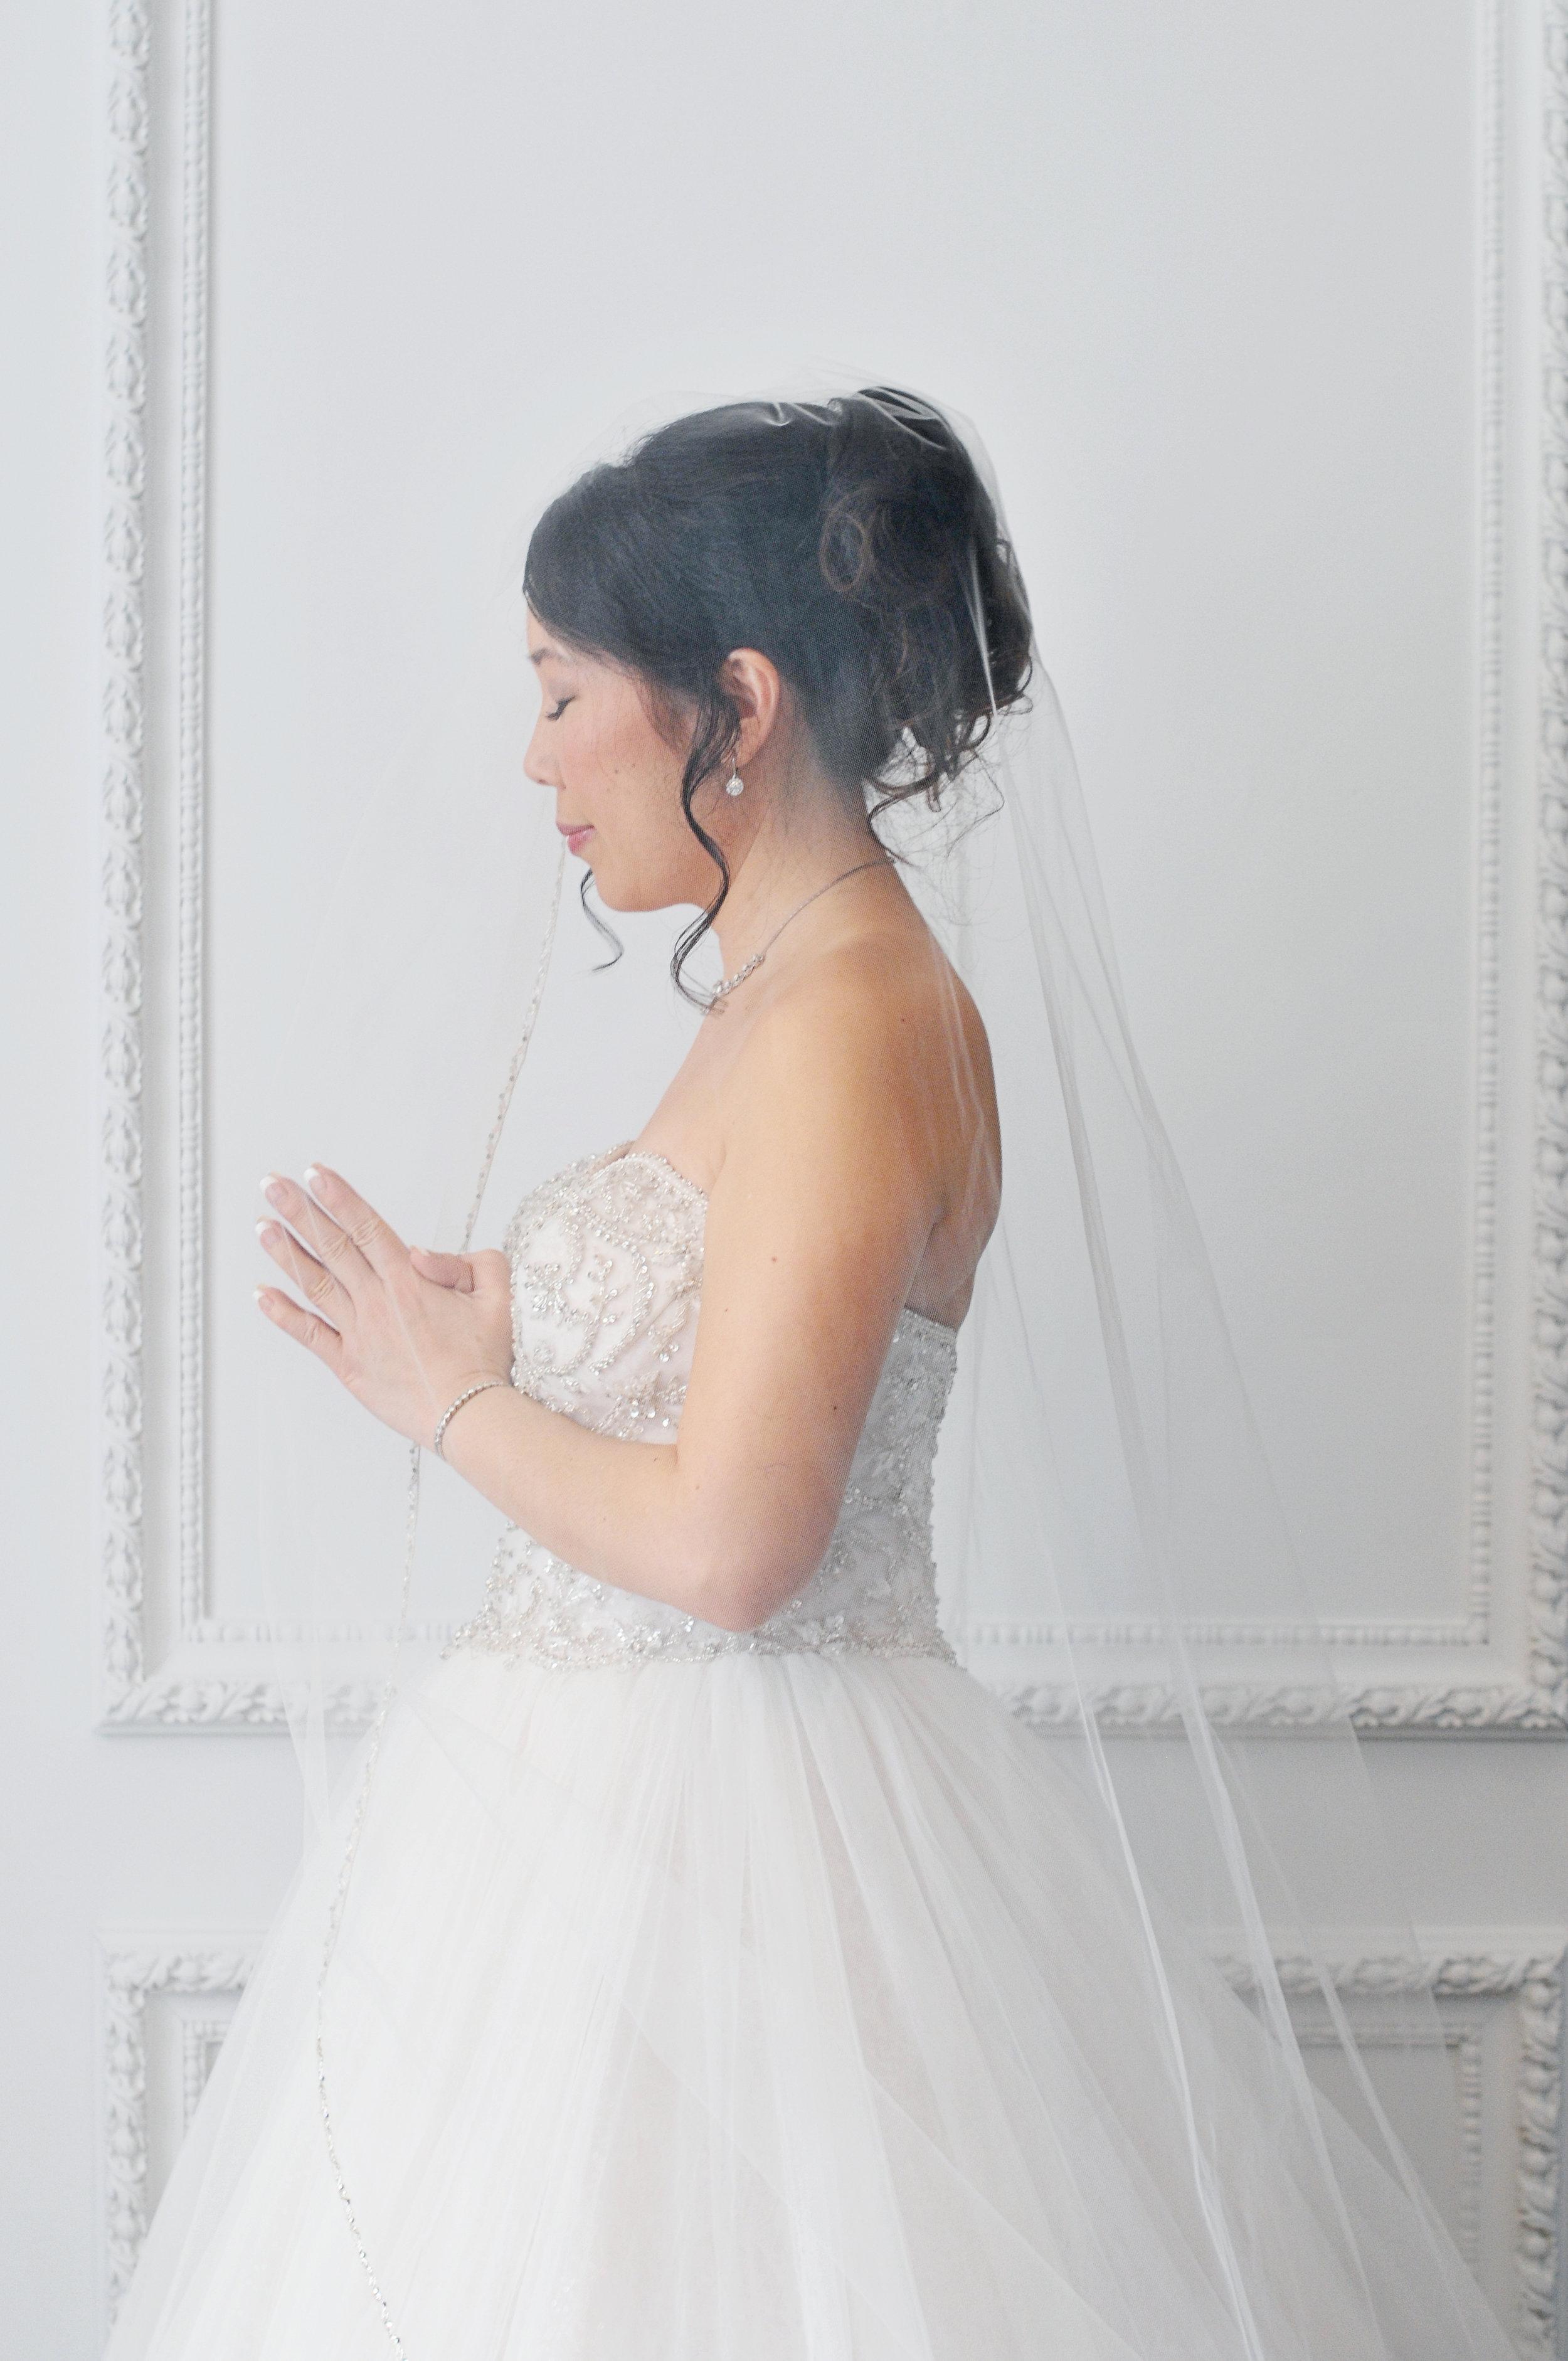 Partovi Wedding 2169 by maria pablo.jpg